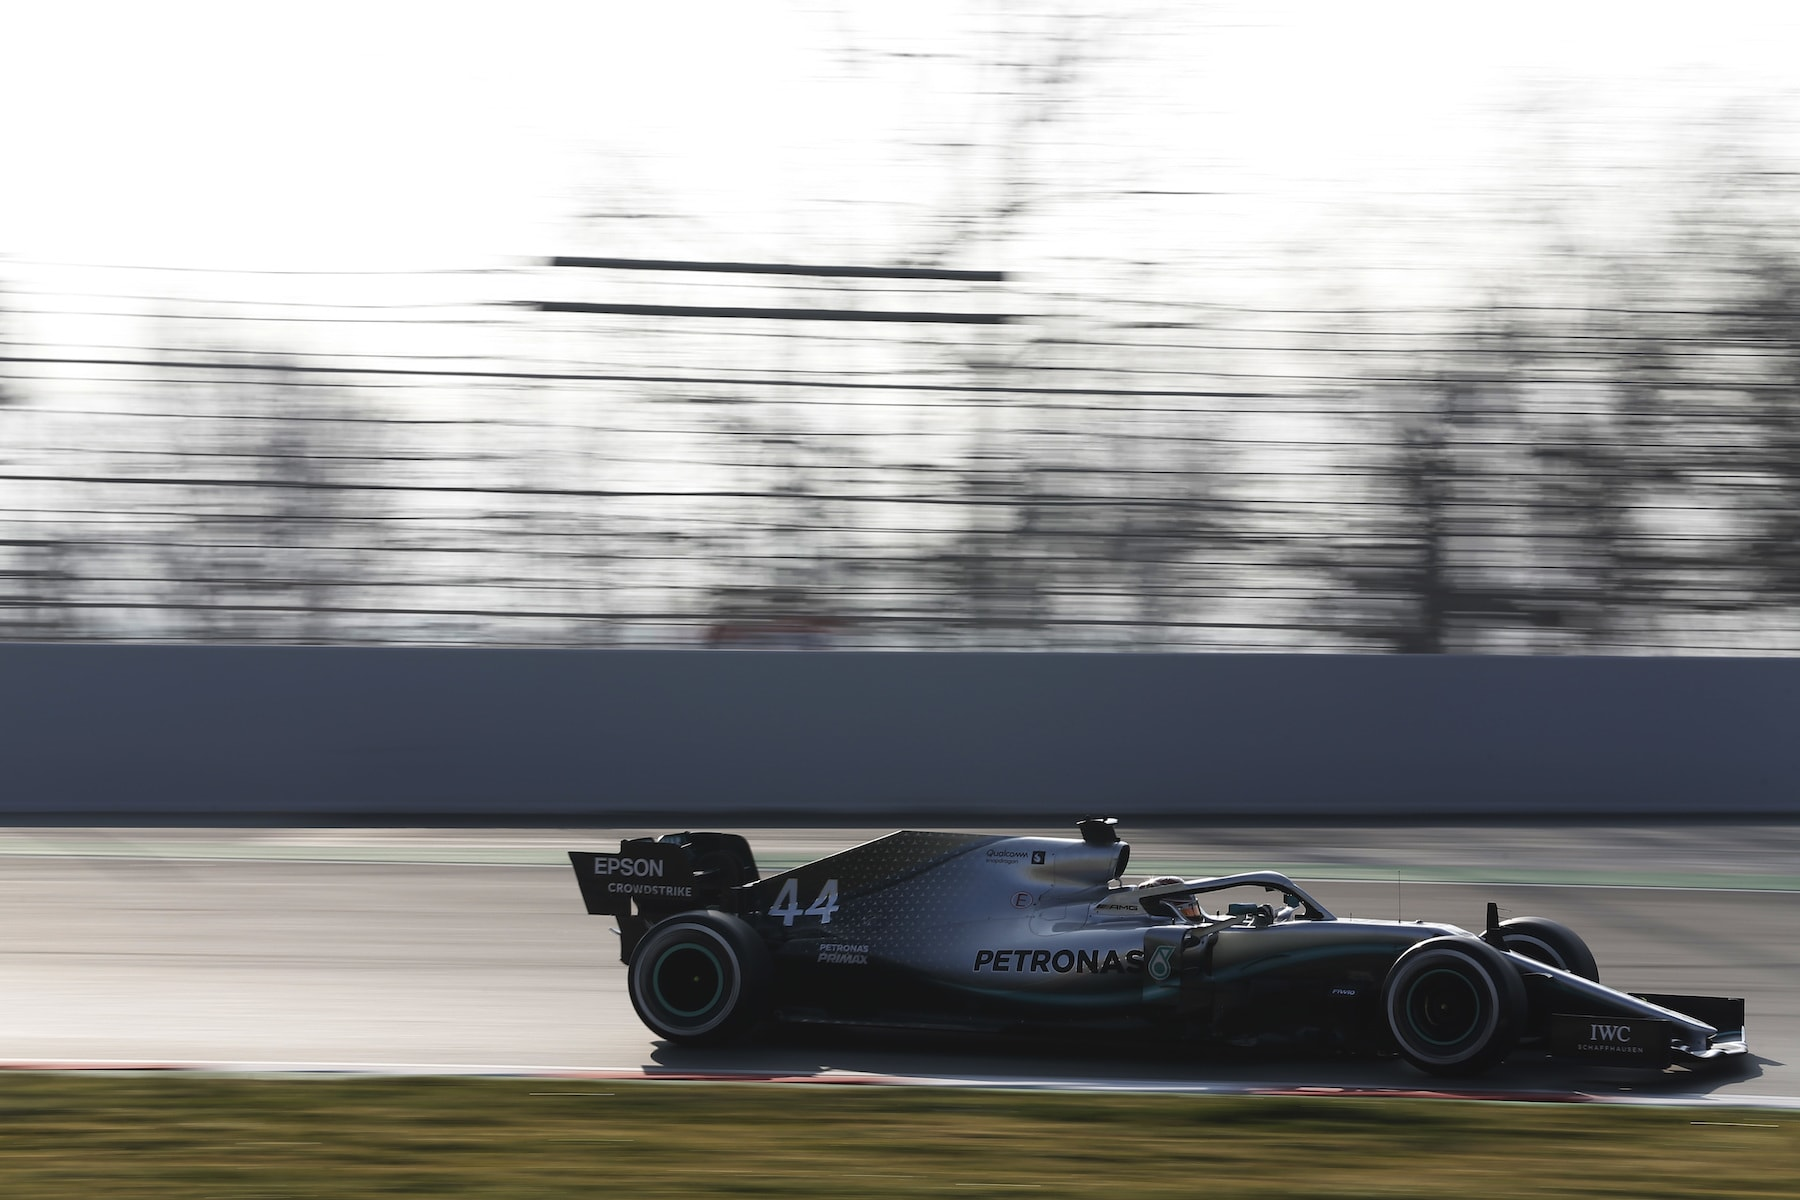 2019 Lewis Hamilton   Mercedes W10   2019 Barcelona T1 D3 1 copy.jpg